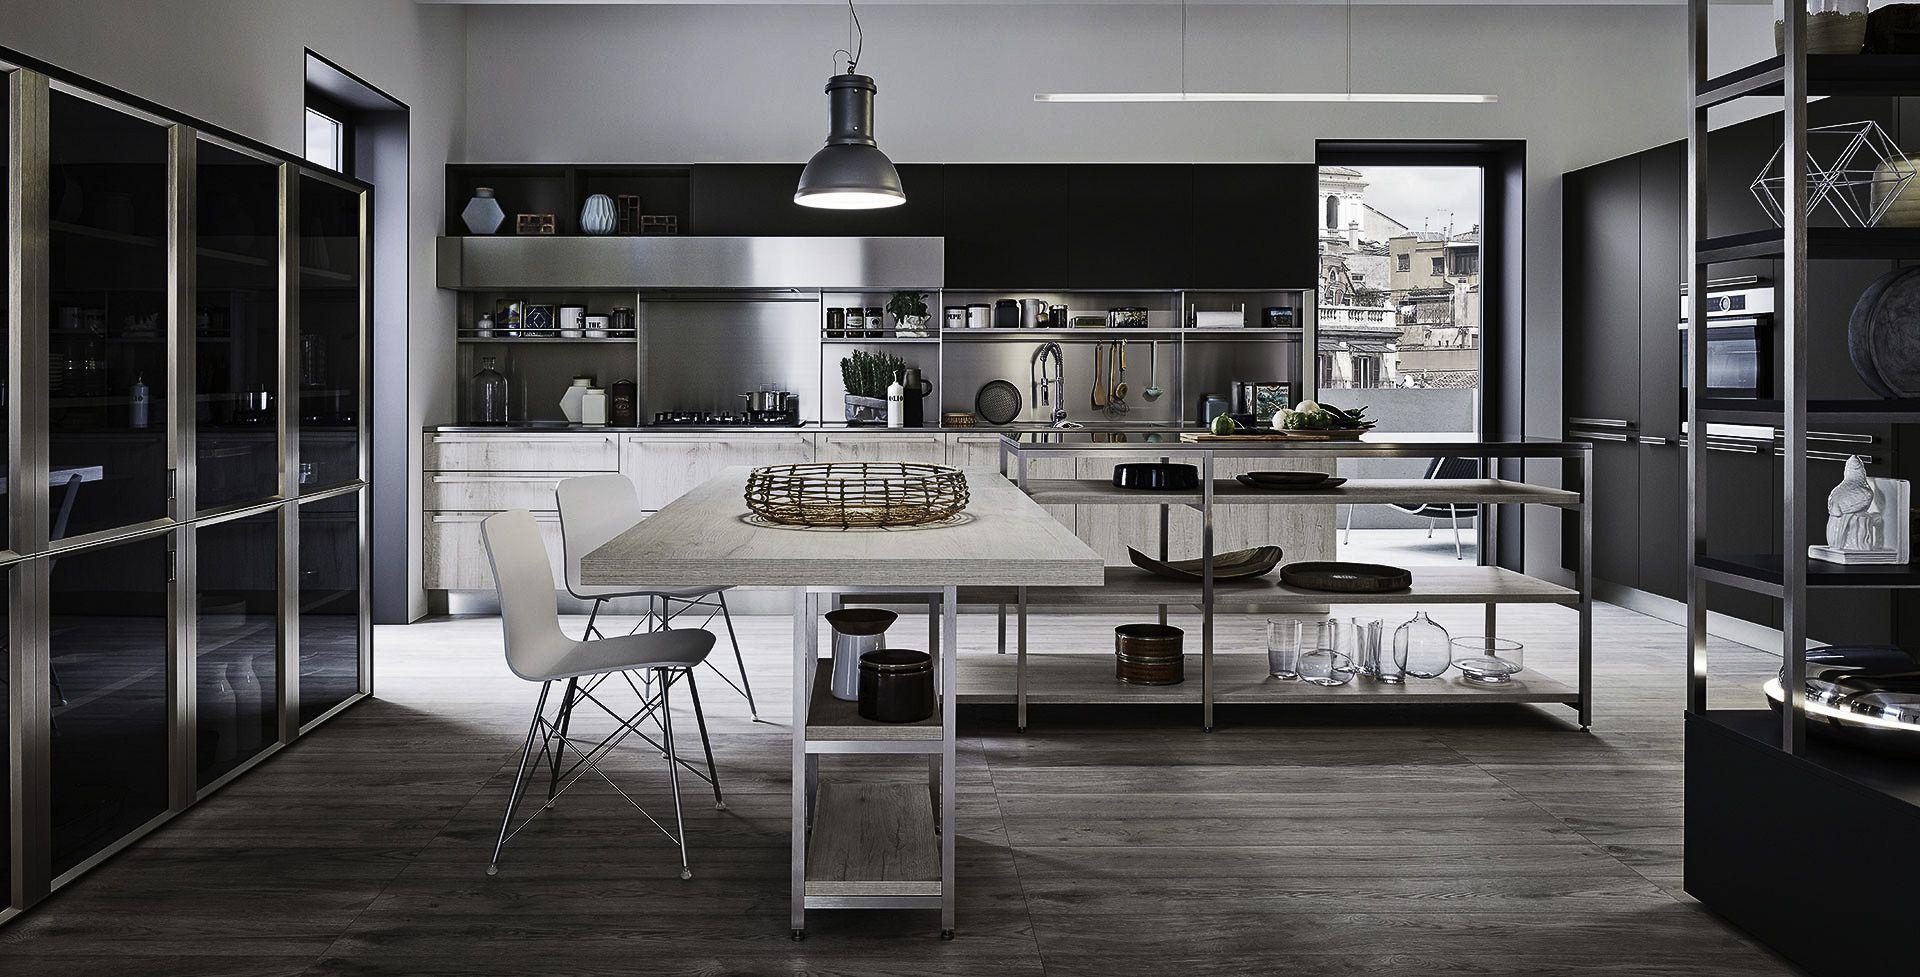 197 Piermarini Design Roma cucina moderna a roma